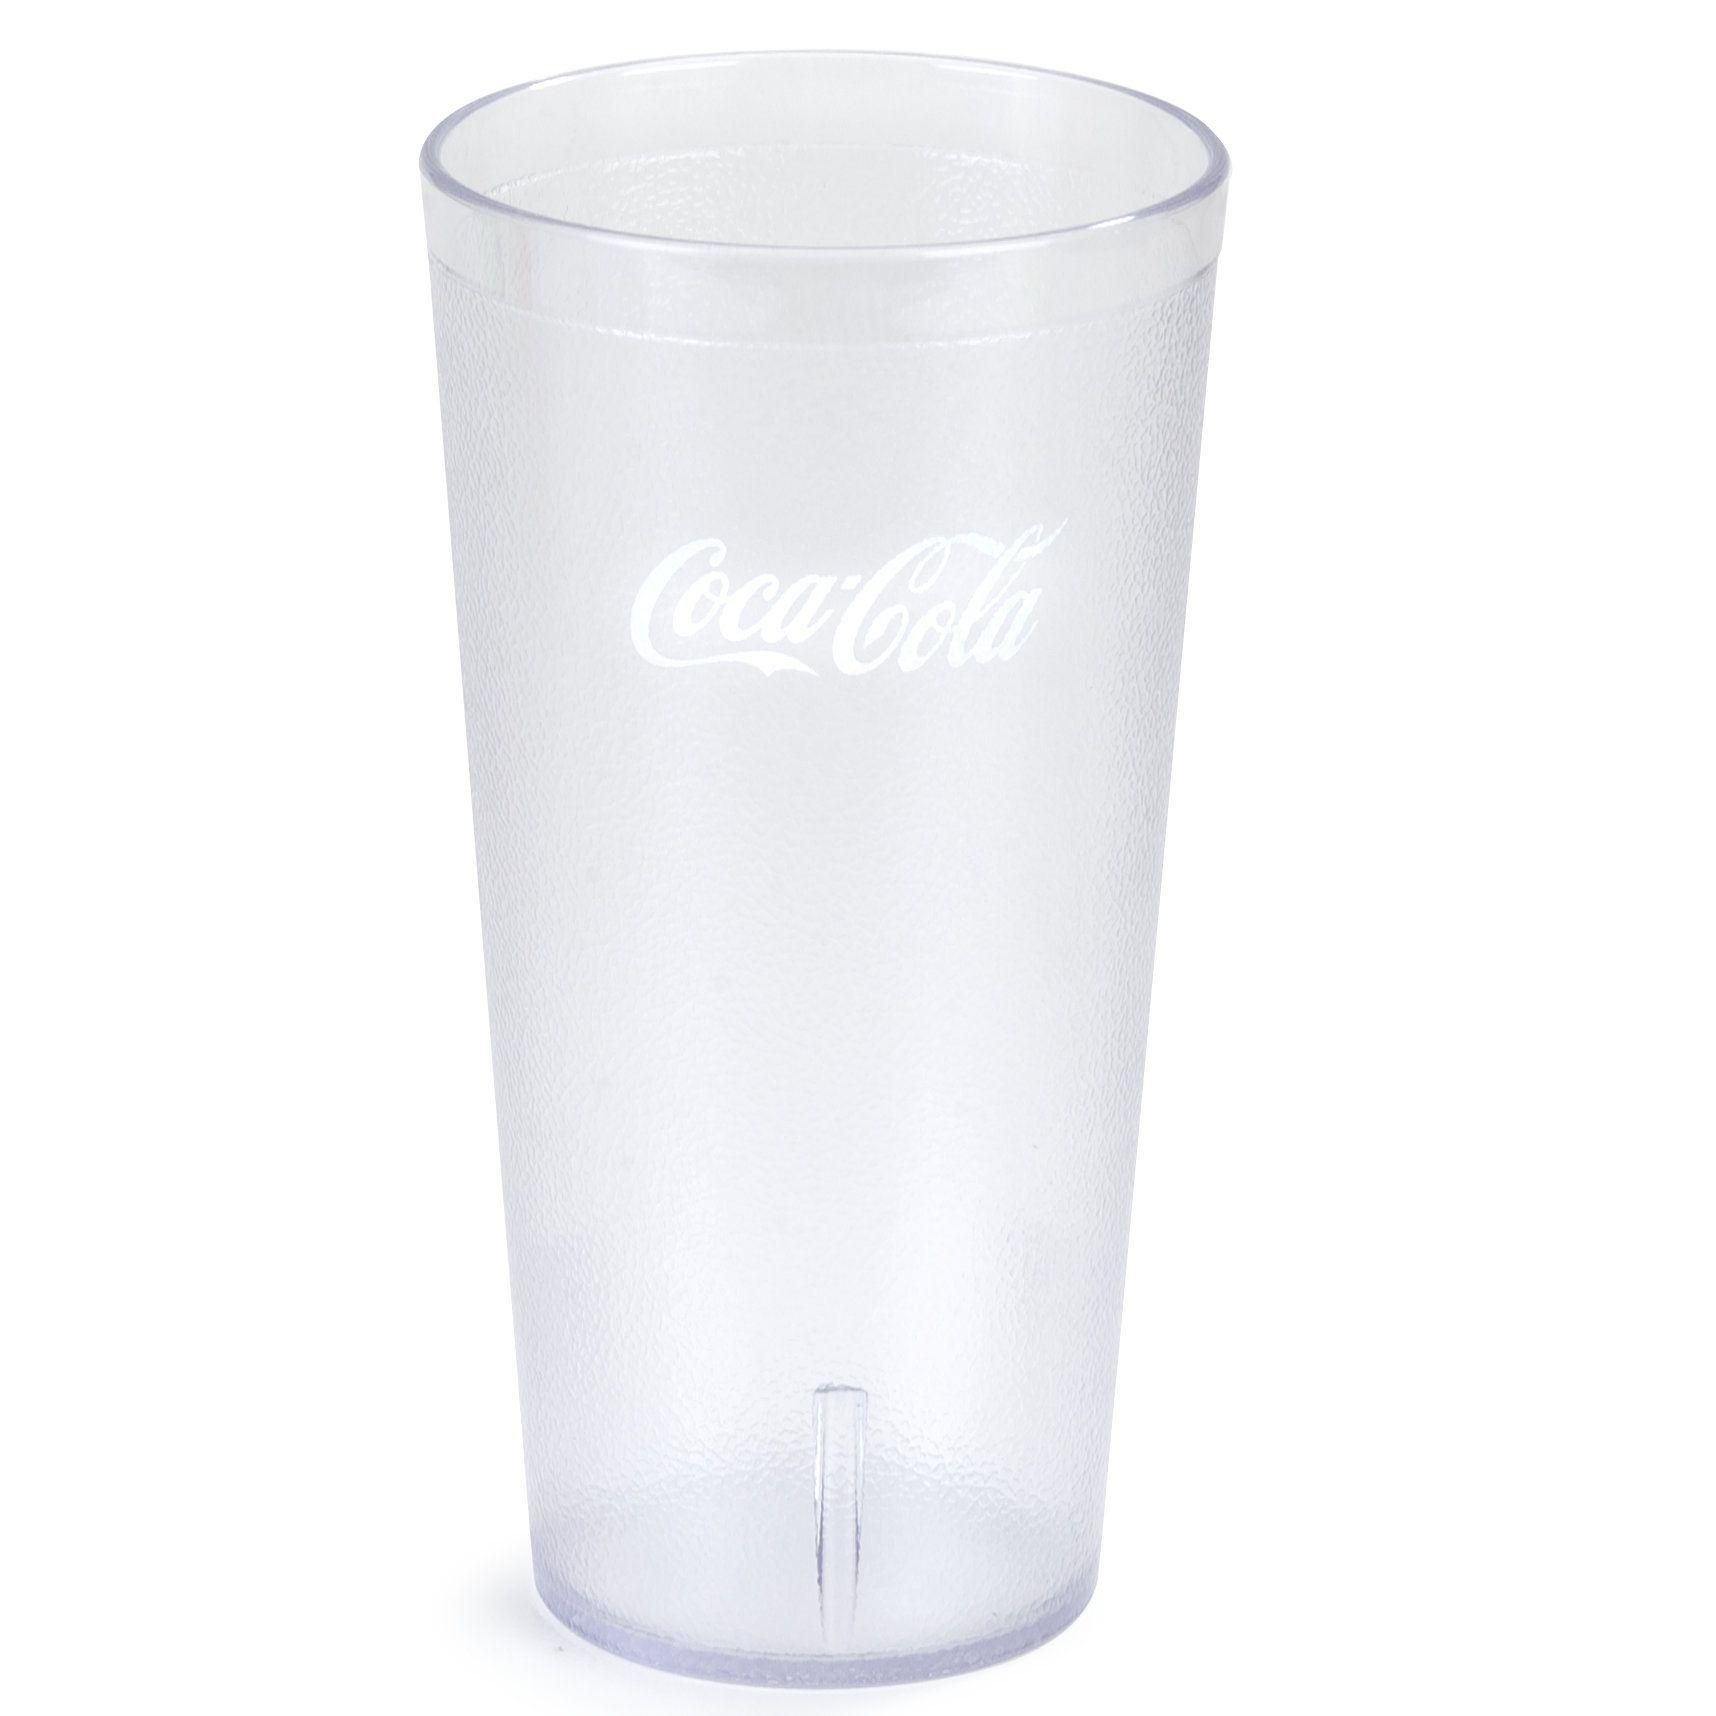 Stackable™ 16 Oz. Coca-Cola® Water/Juice Glass (Set of 72)